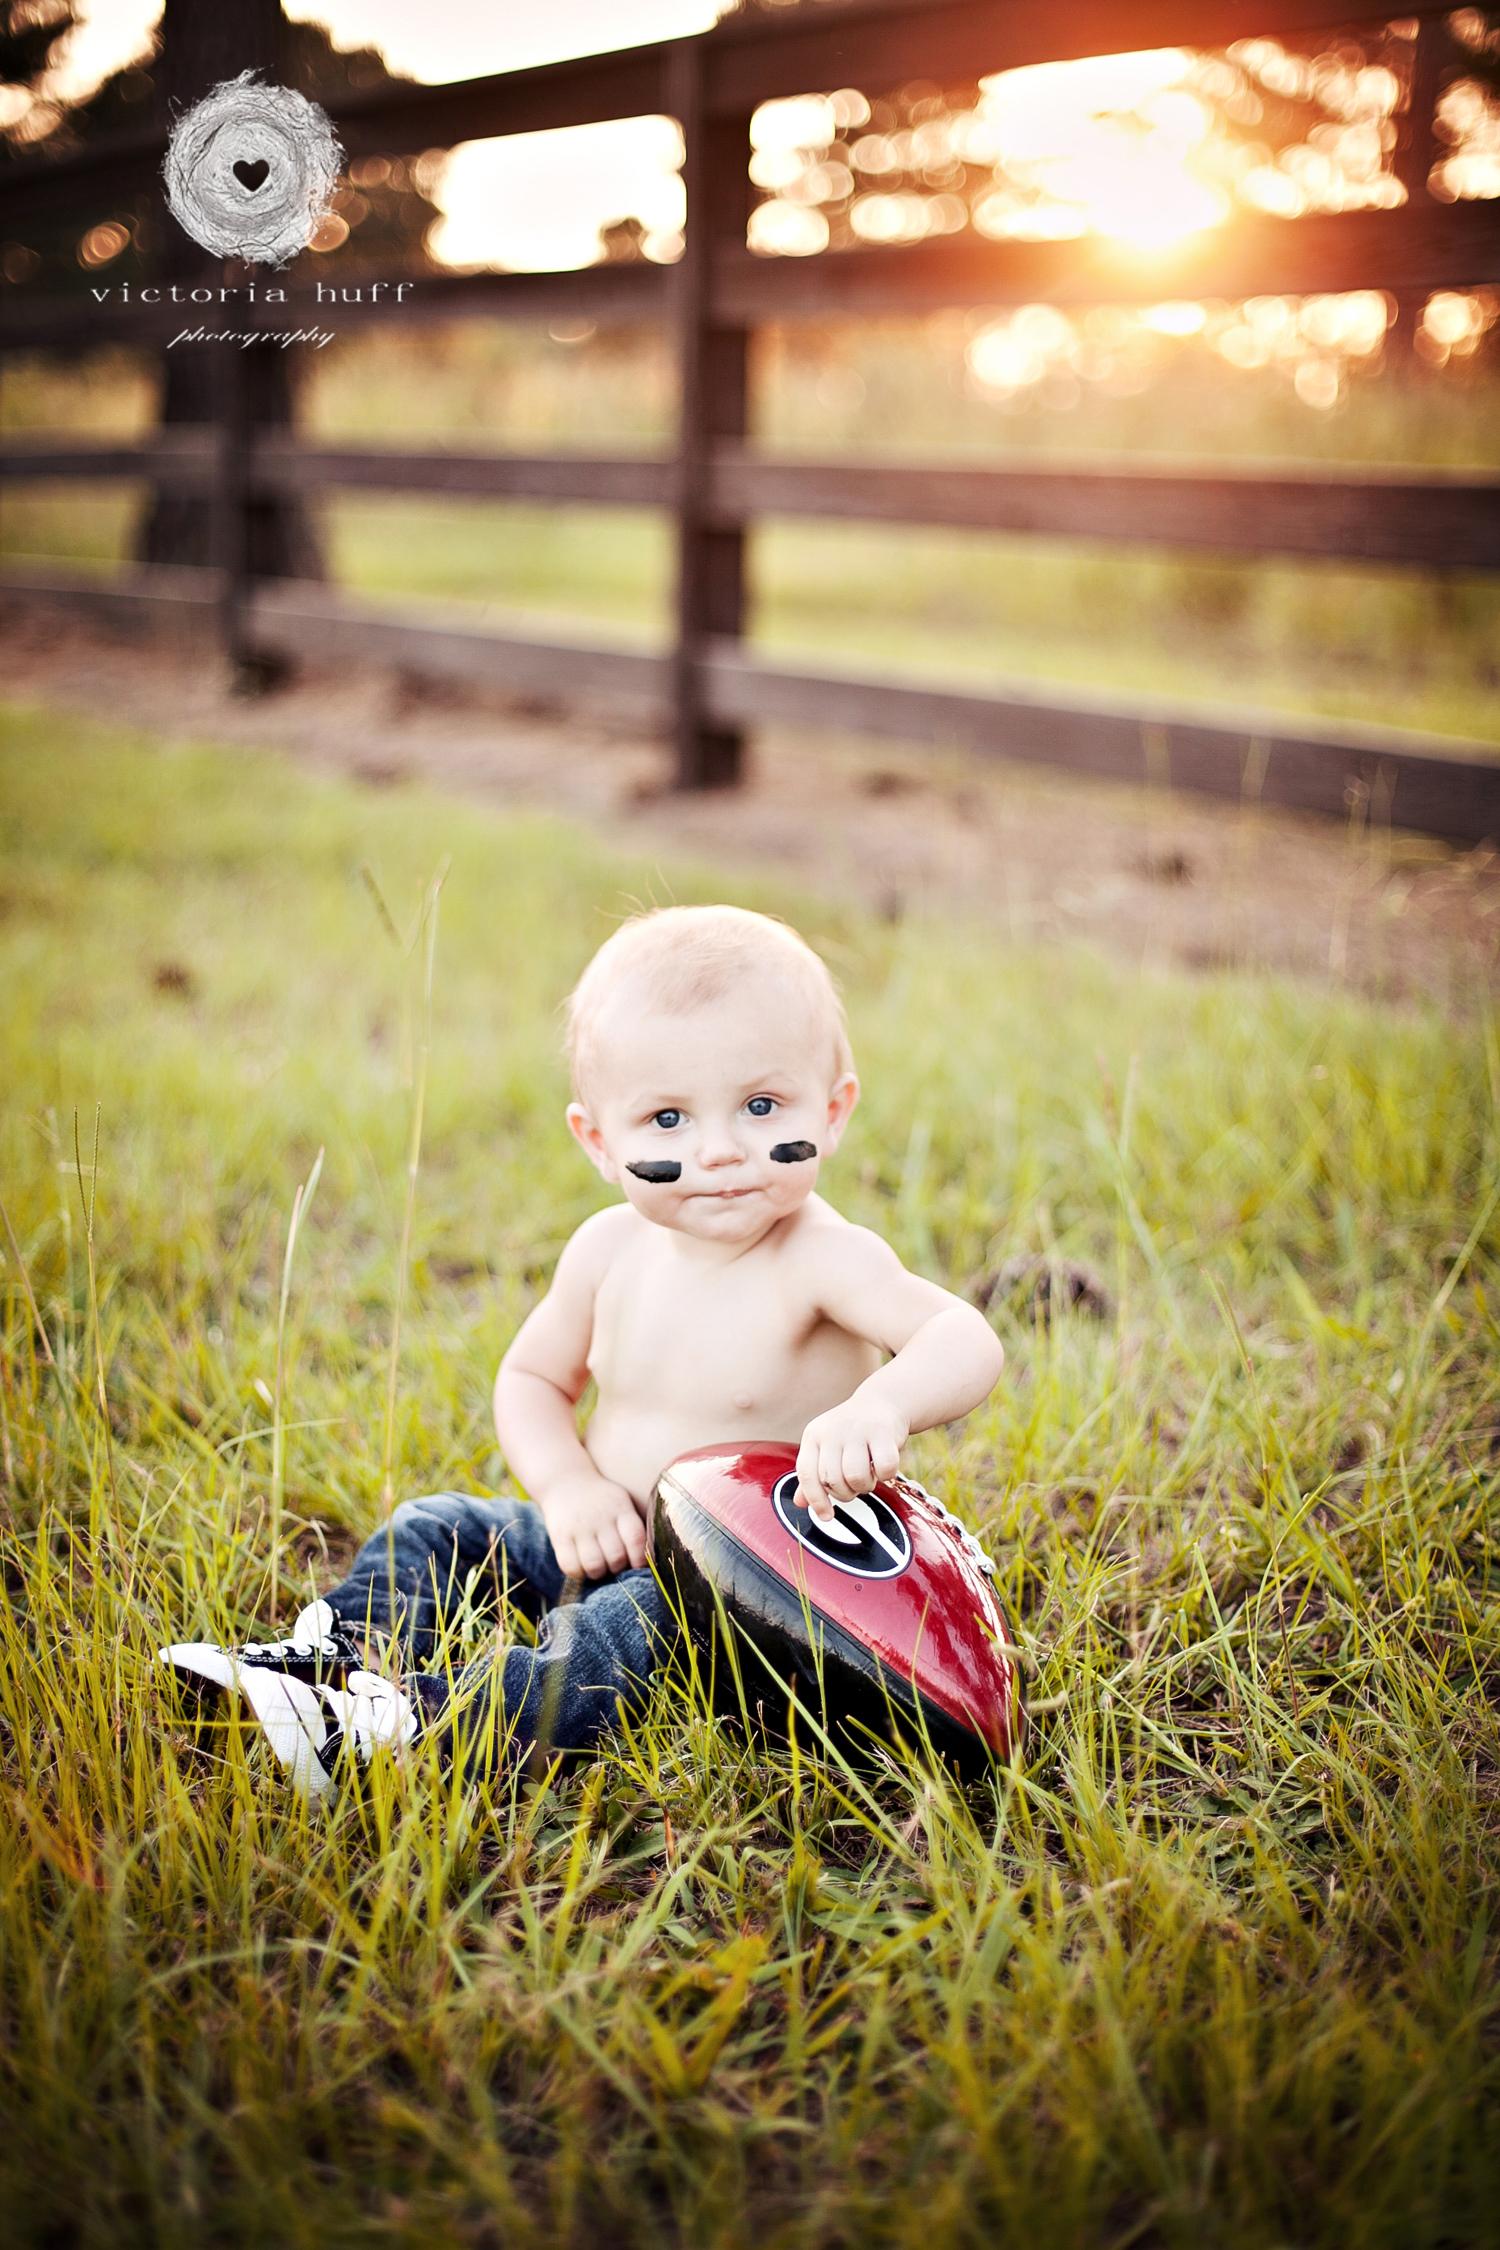 Brayson-Athens-Georgia-toddler-footbal-UGA-baby-photography-4.jpg